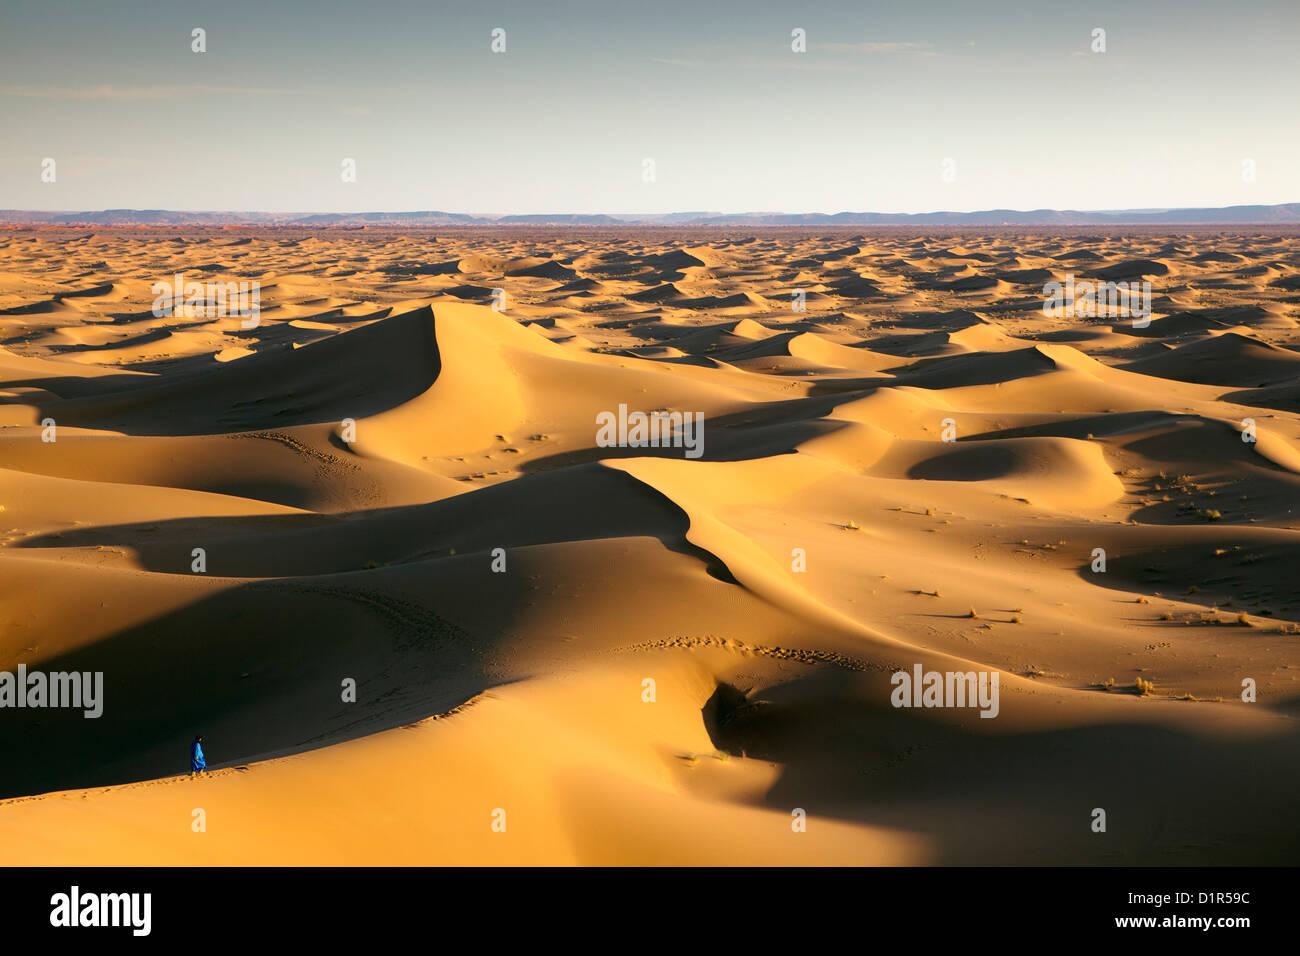 Marokko, M' Hamid, Erg Chigaga Dünen. Wüste Sahara. Lokalen Berber Mann auf Sanddüne, Hintergrund Stockbild